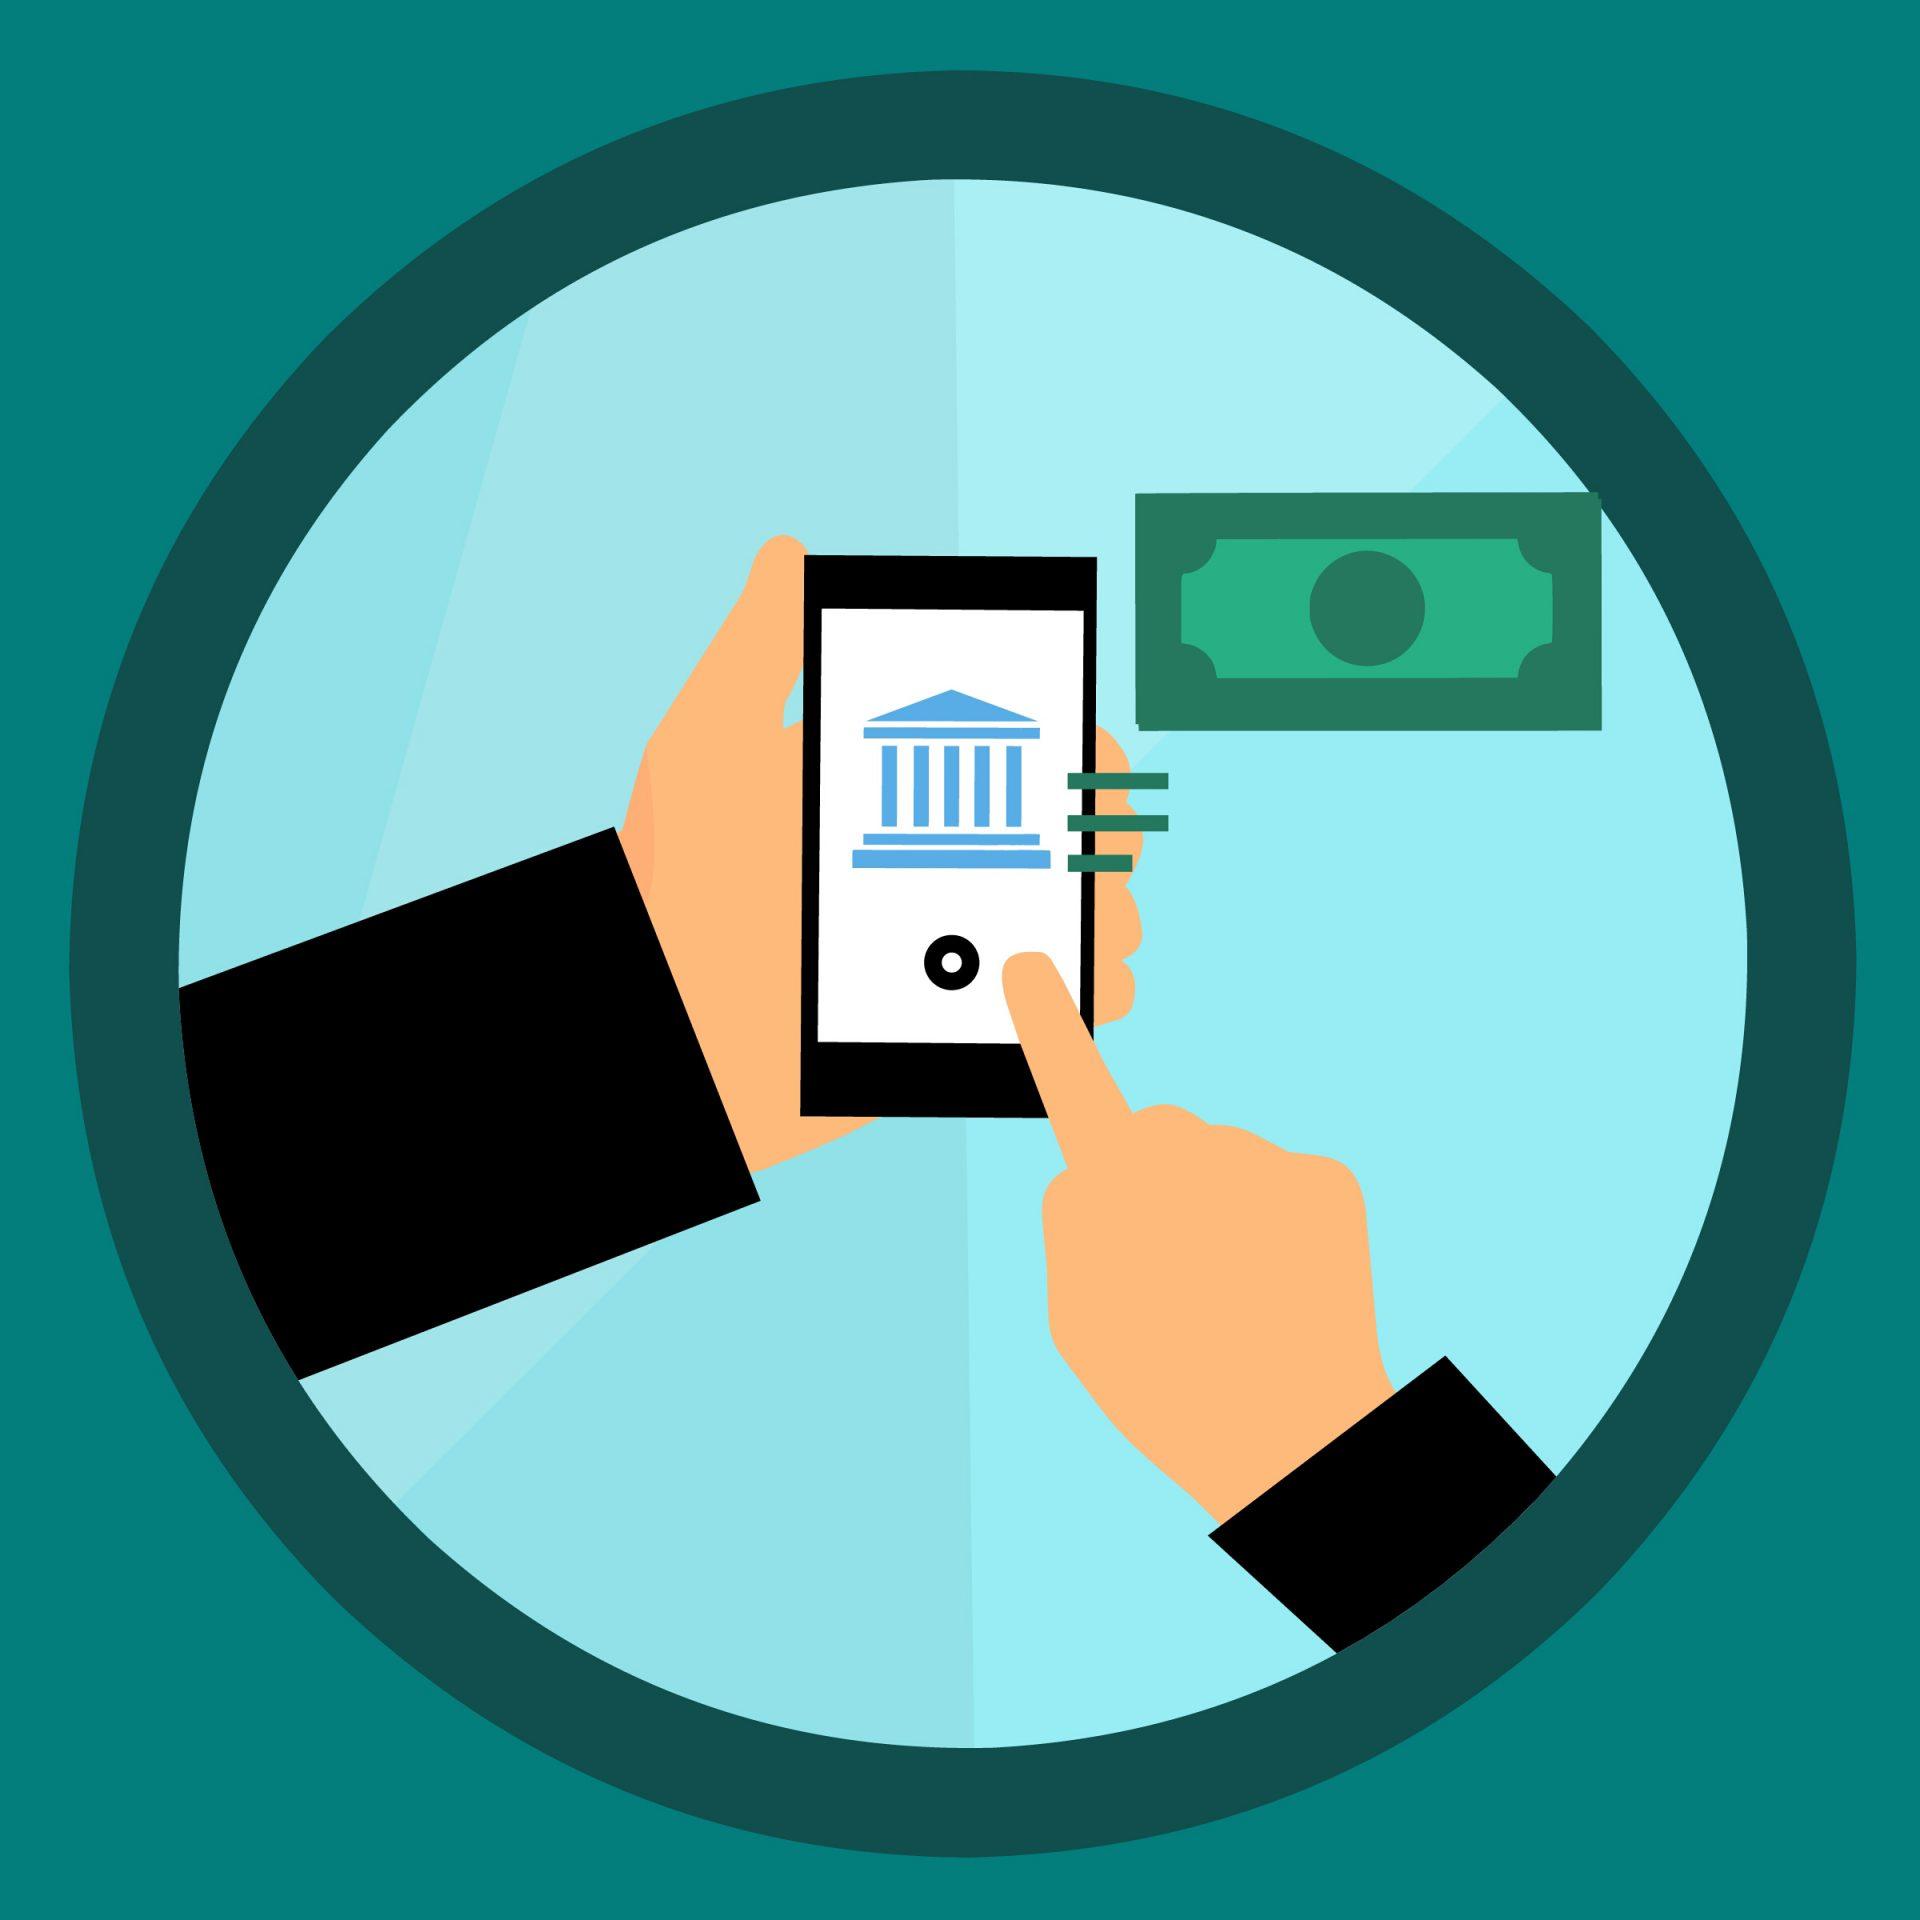 money-transfer-banking-icon-buy-communication-1447513-pxhere.com